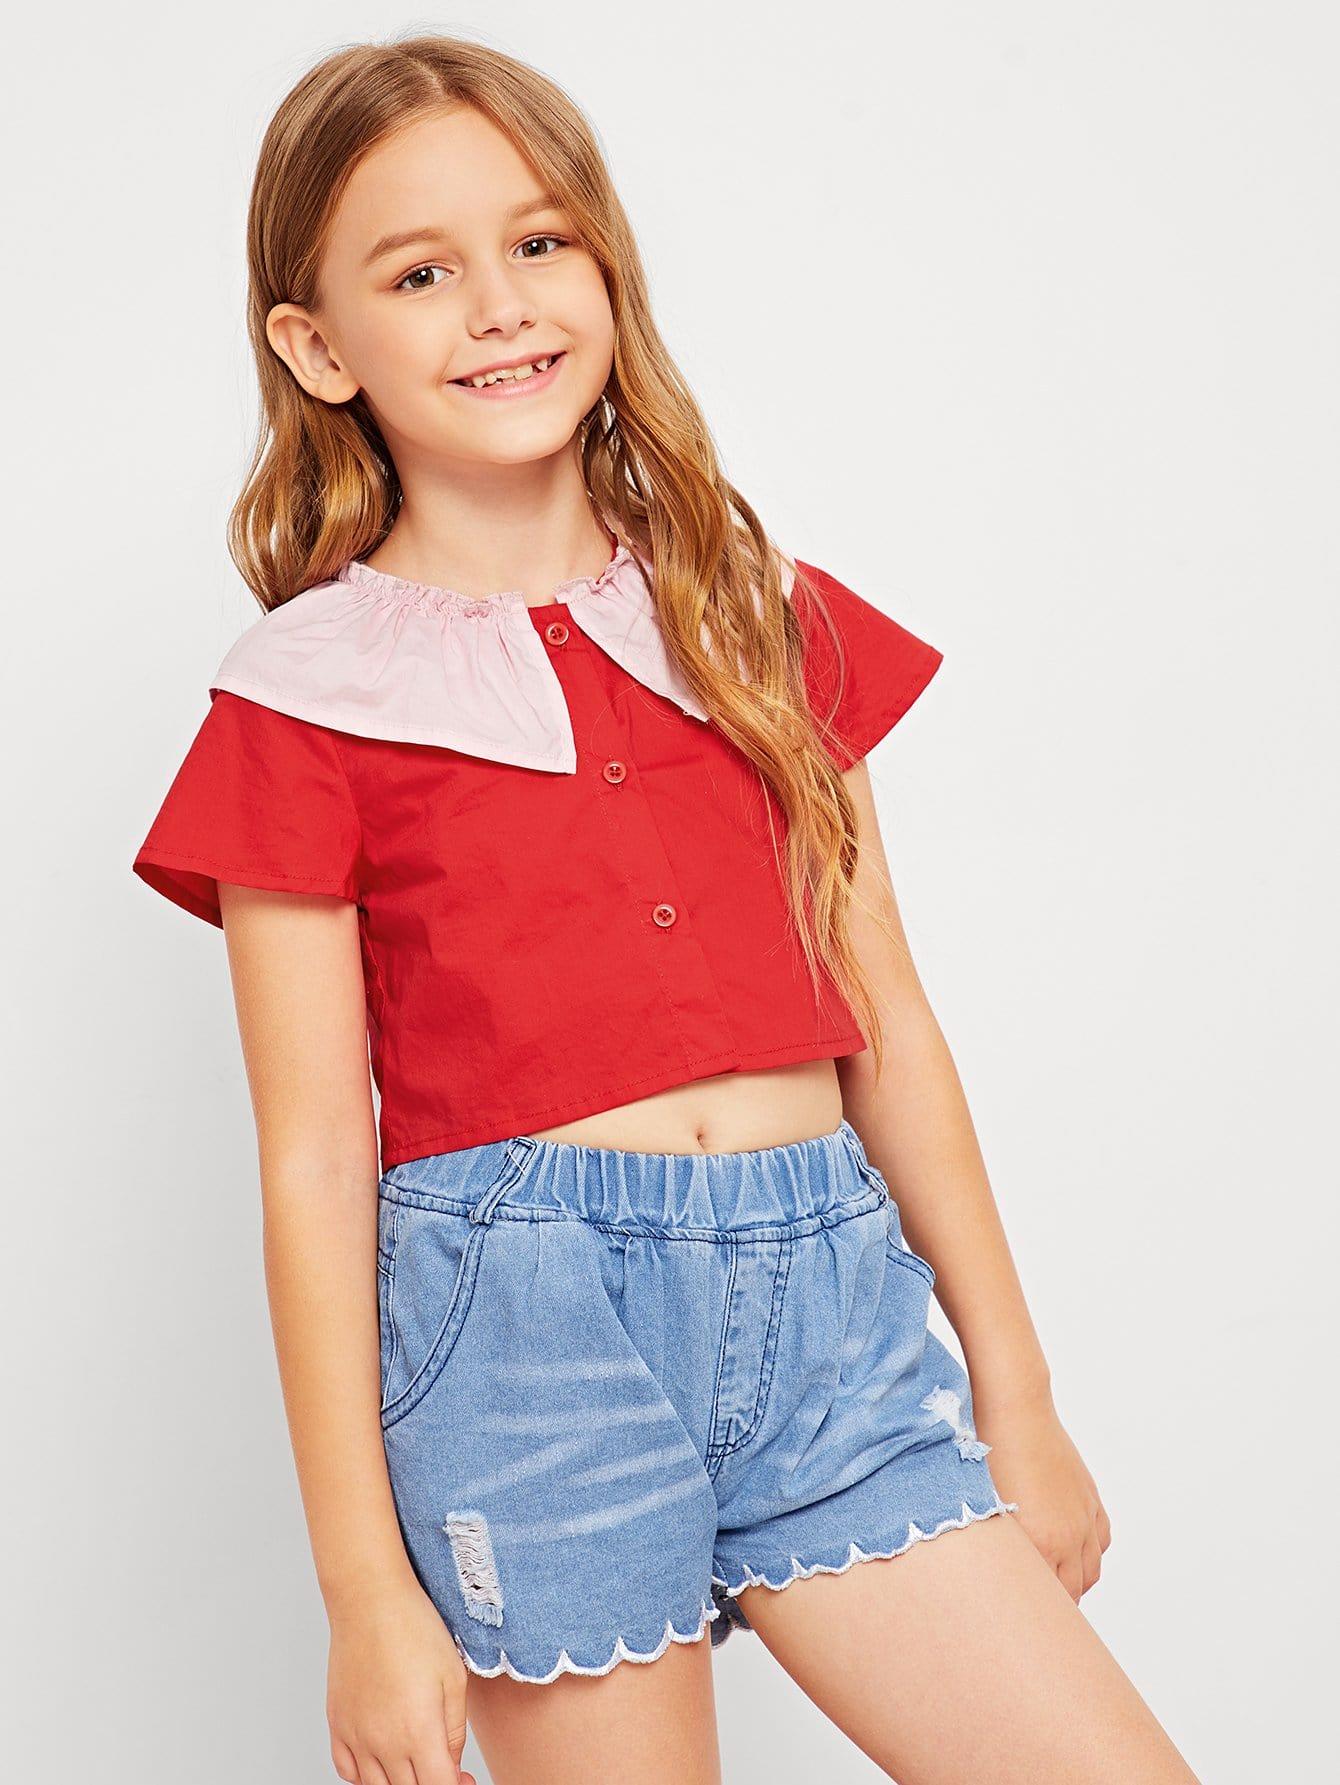 Девушки Frill Neckline Button Передняя блузка, Sashab, SheIn  - купить со скидкой